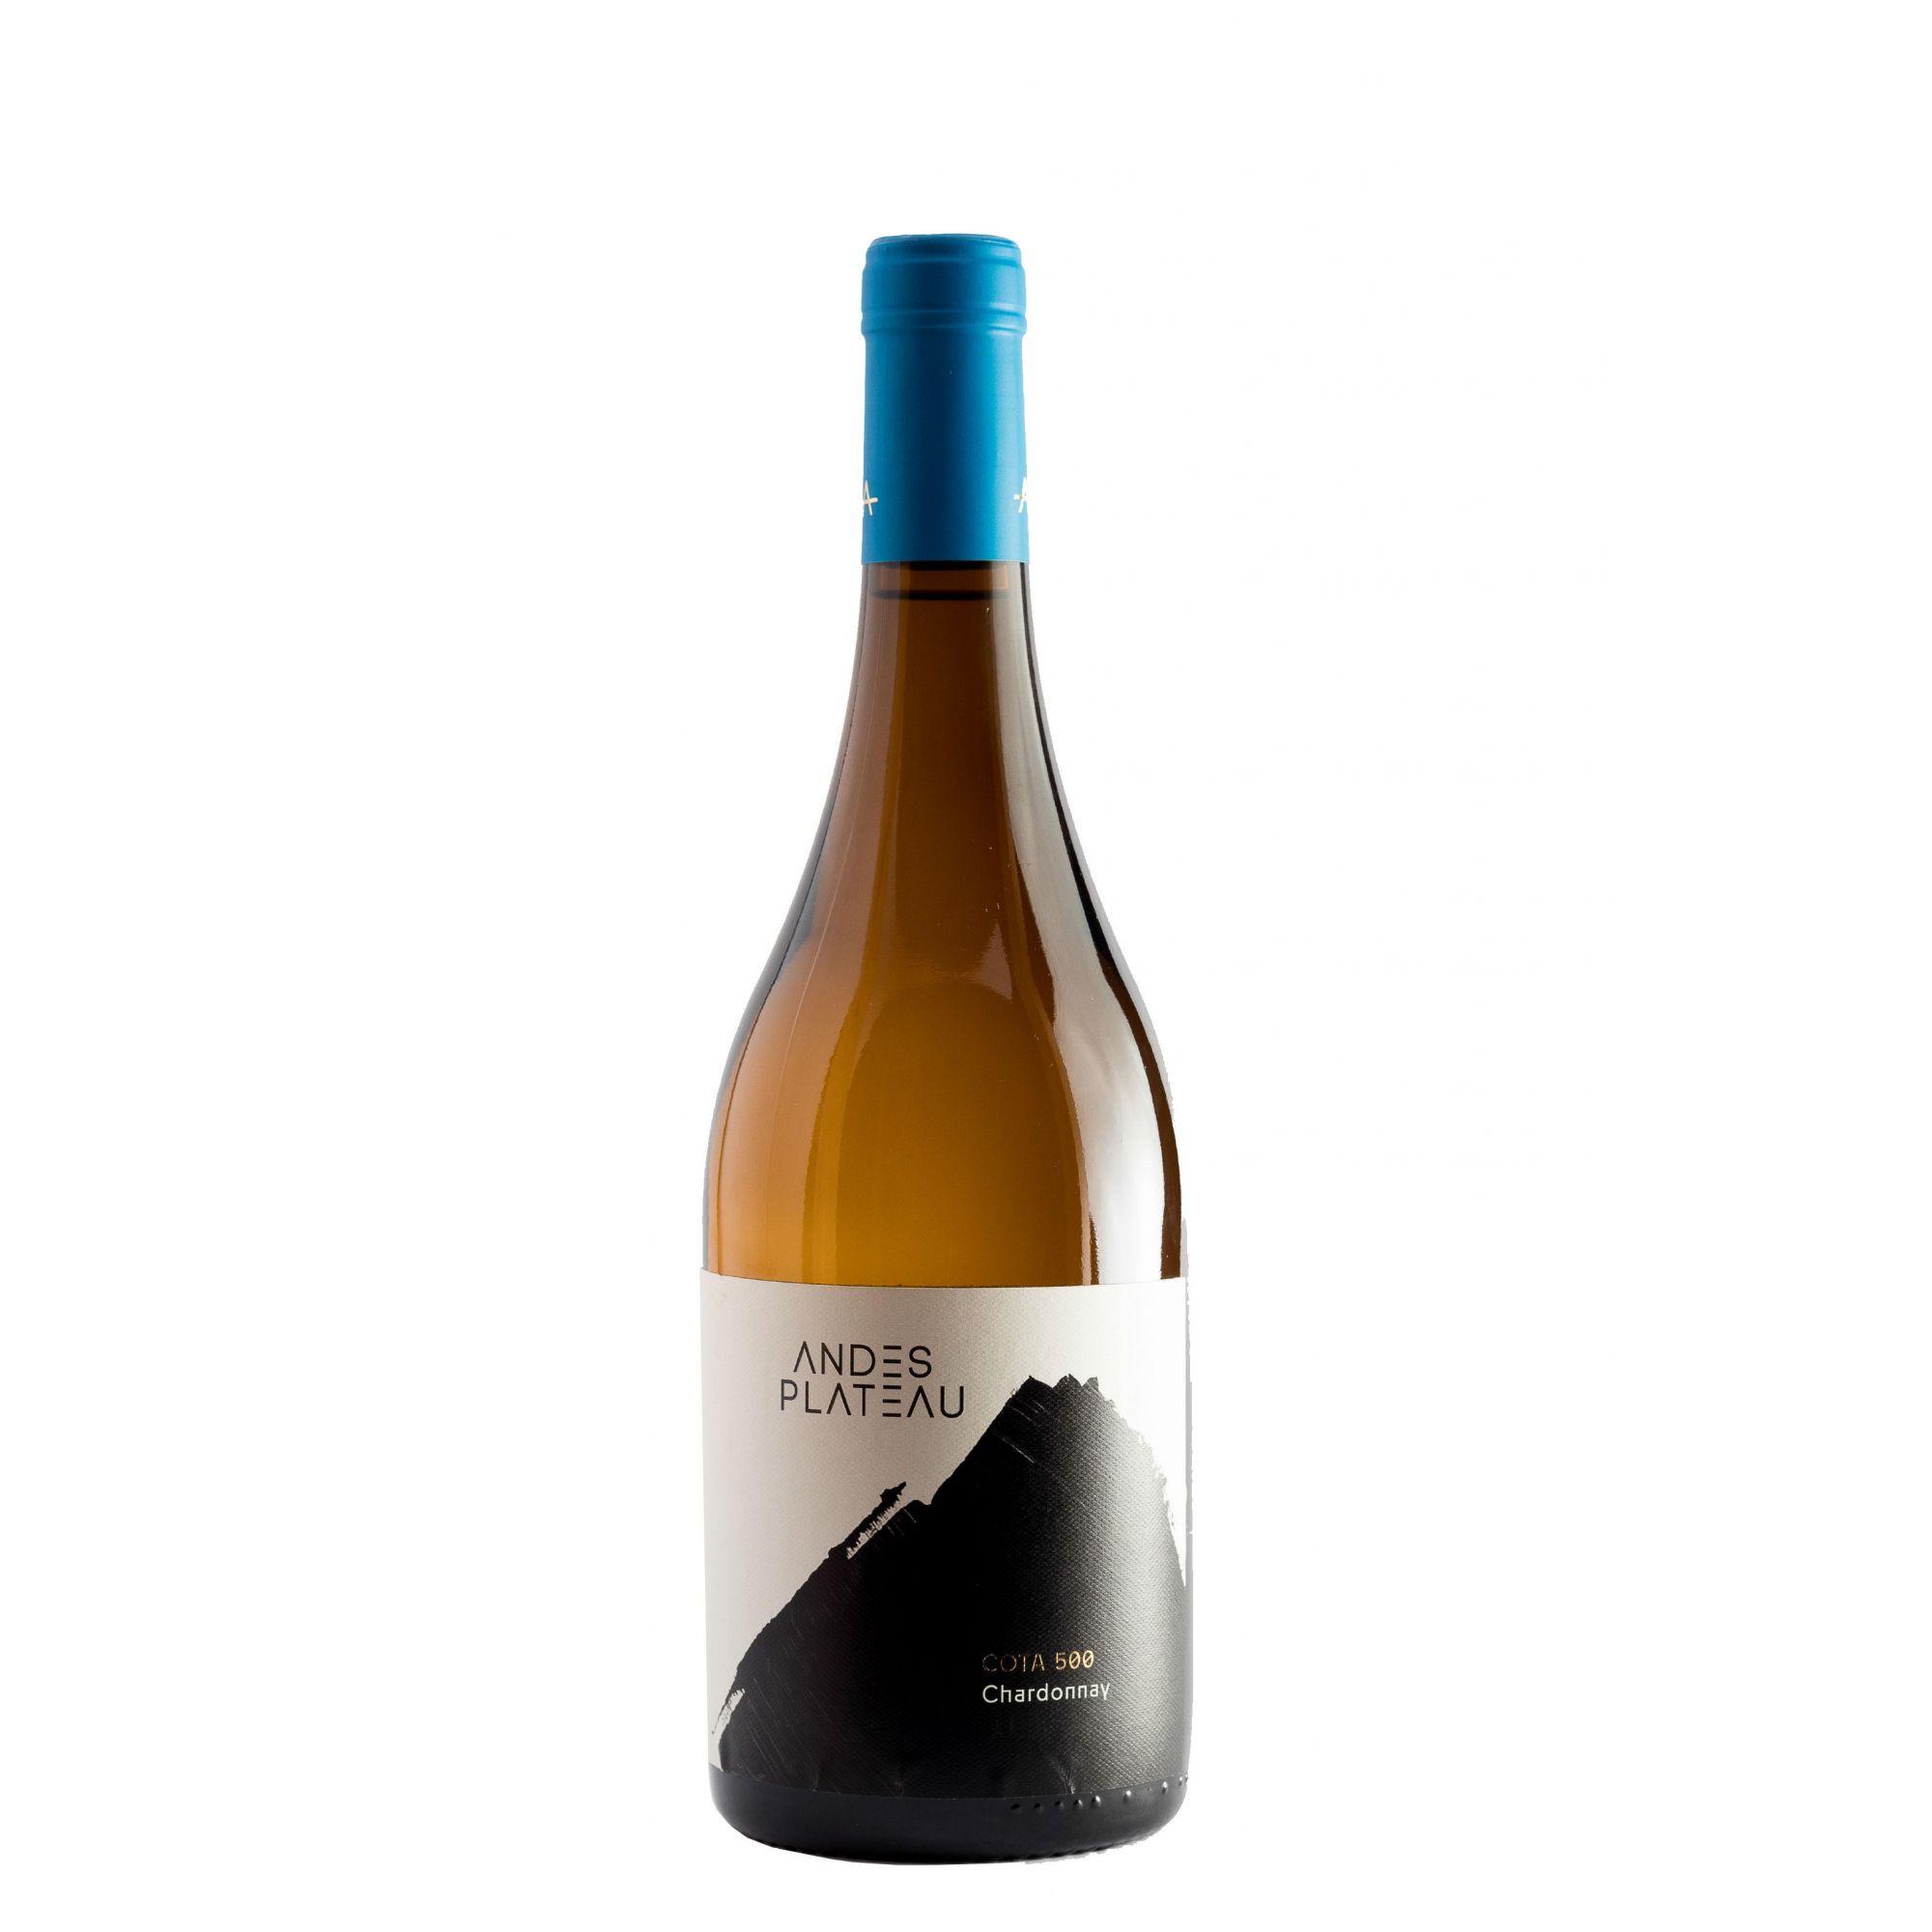 Vinho Cota 500 Andes Plateau Chardonnay 2019